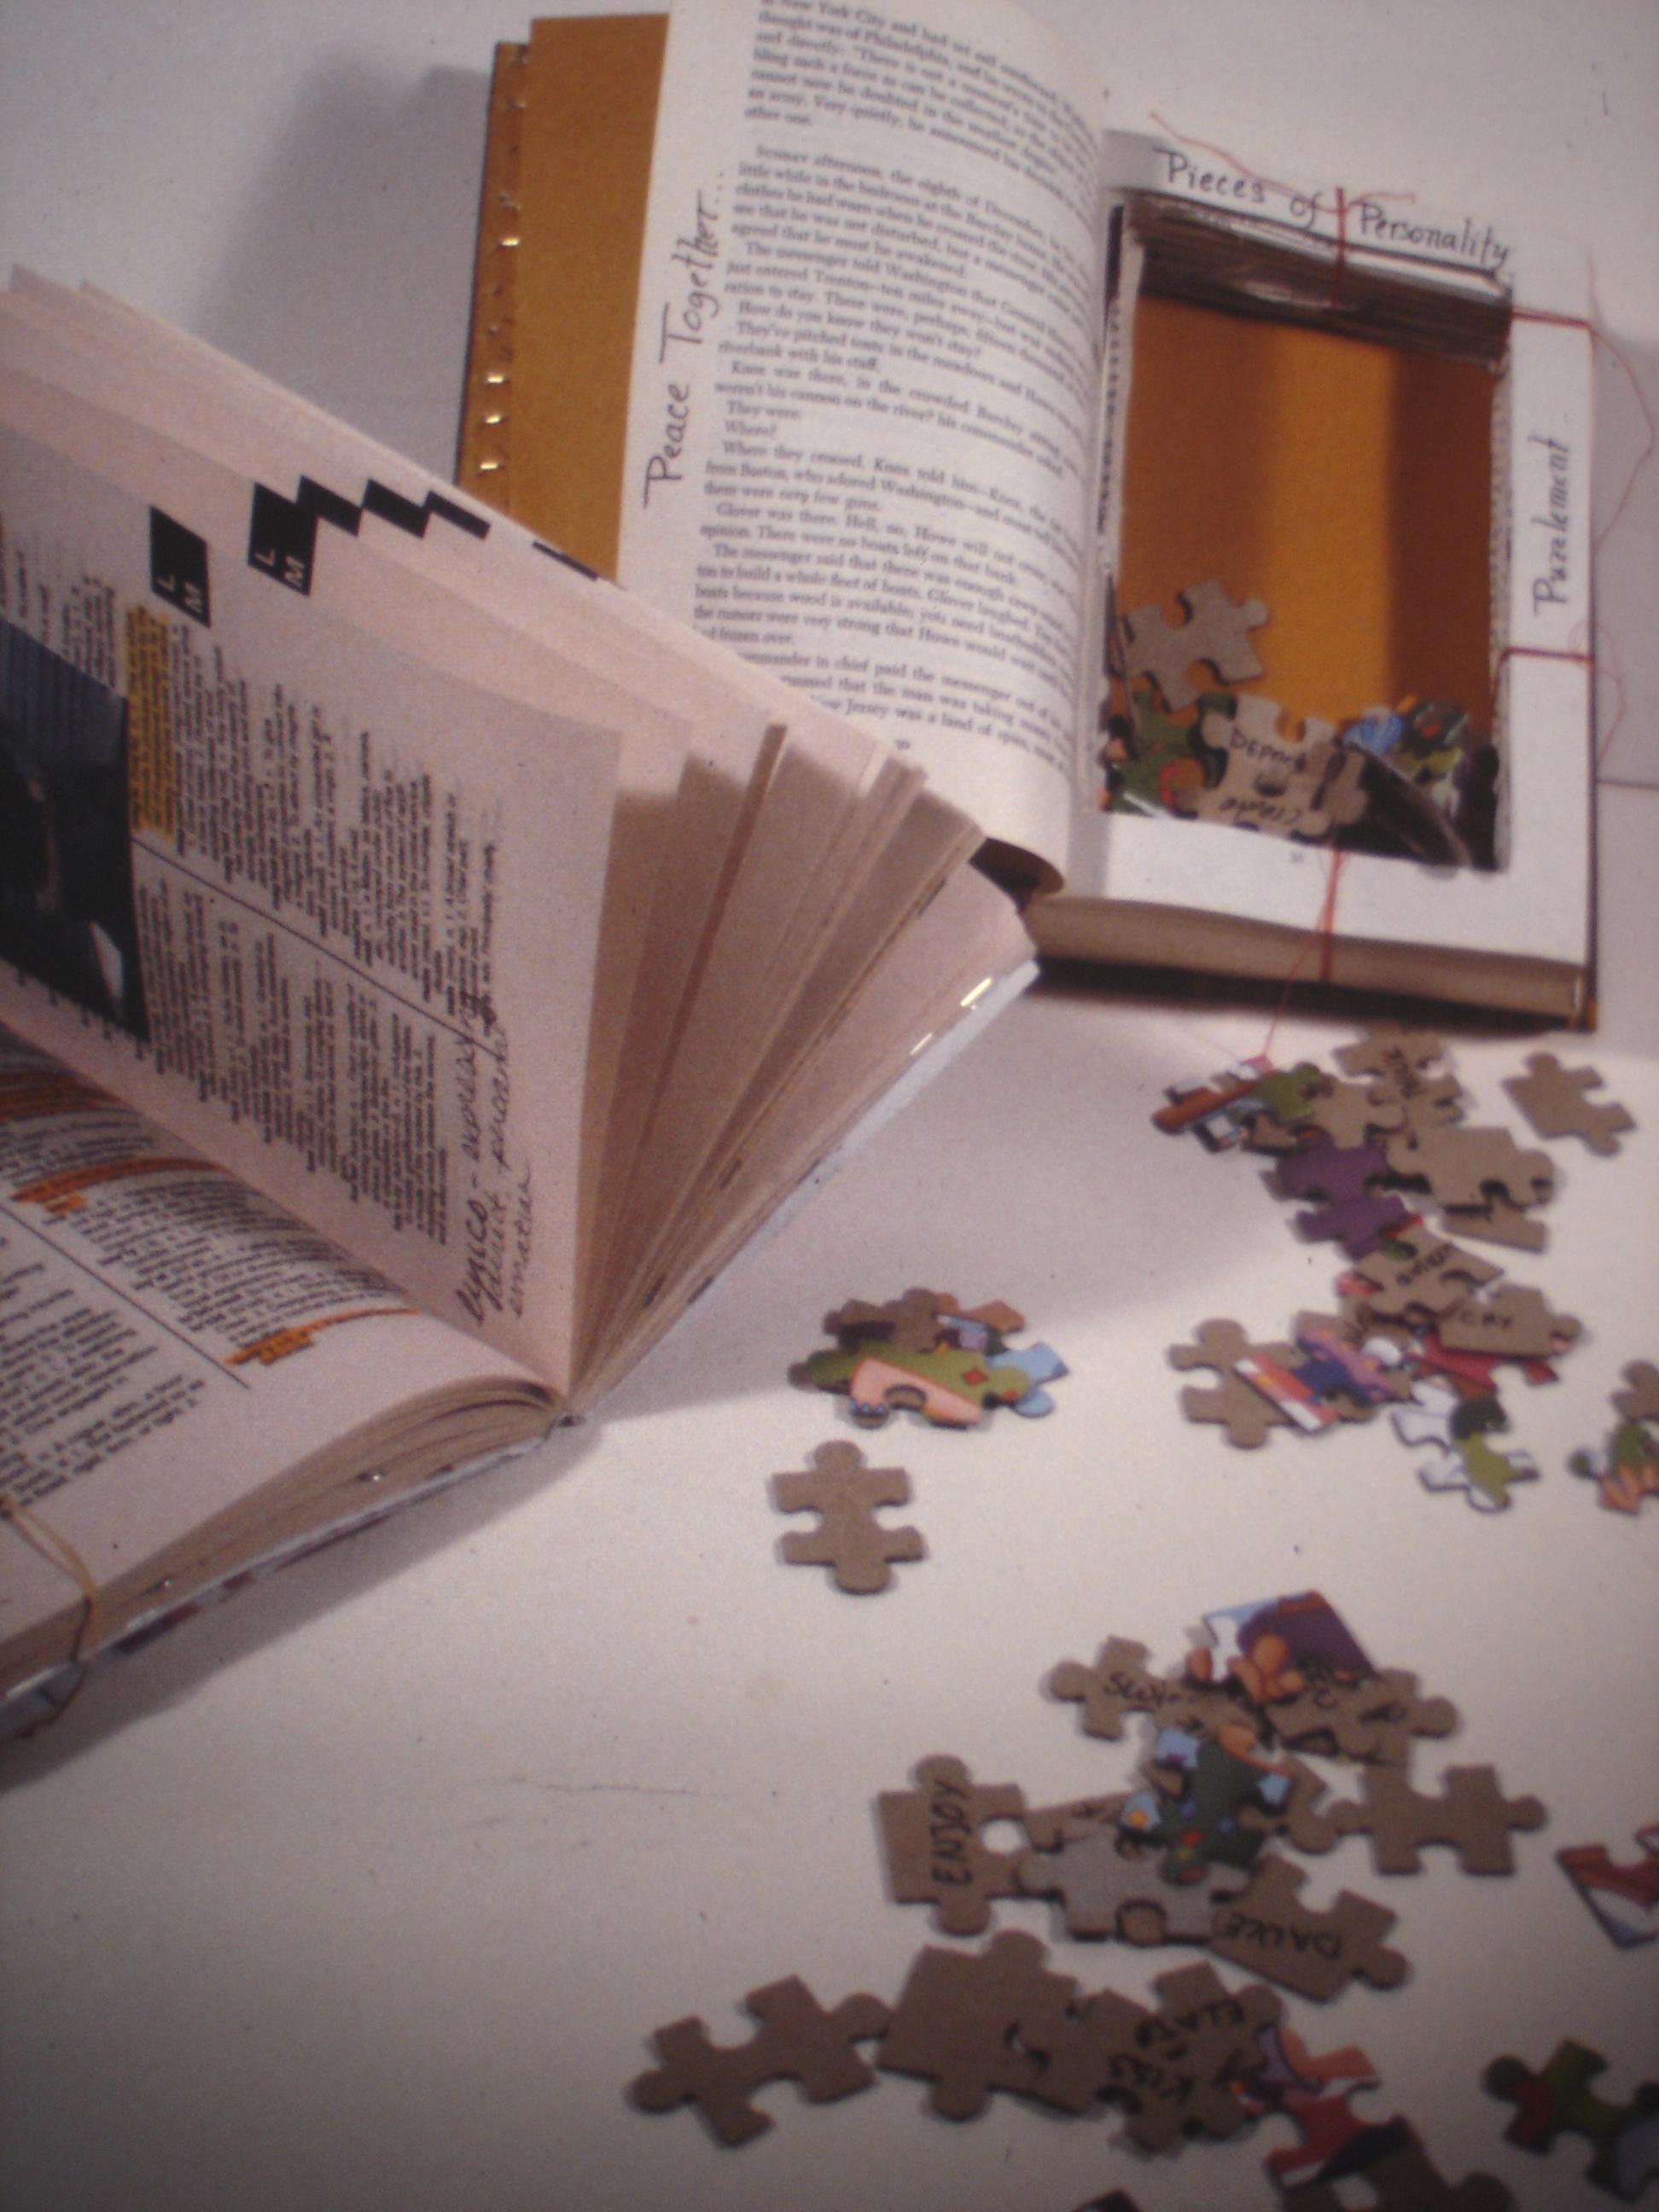 Mixed Media, Book, Puzzle Pieces